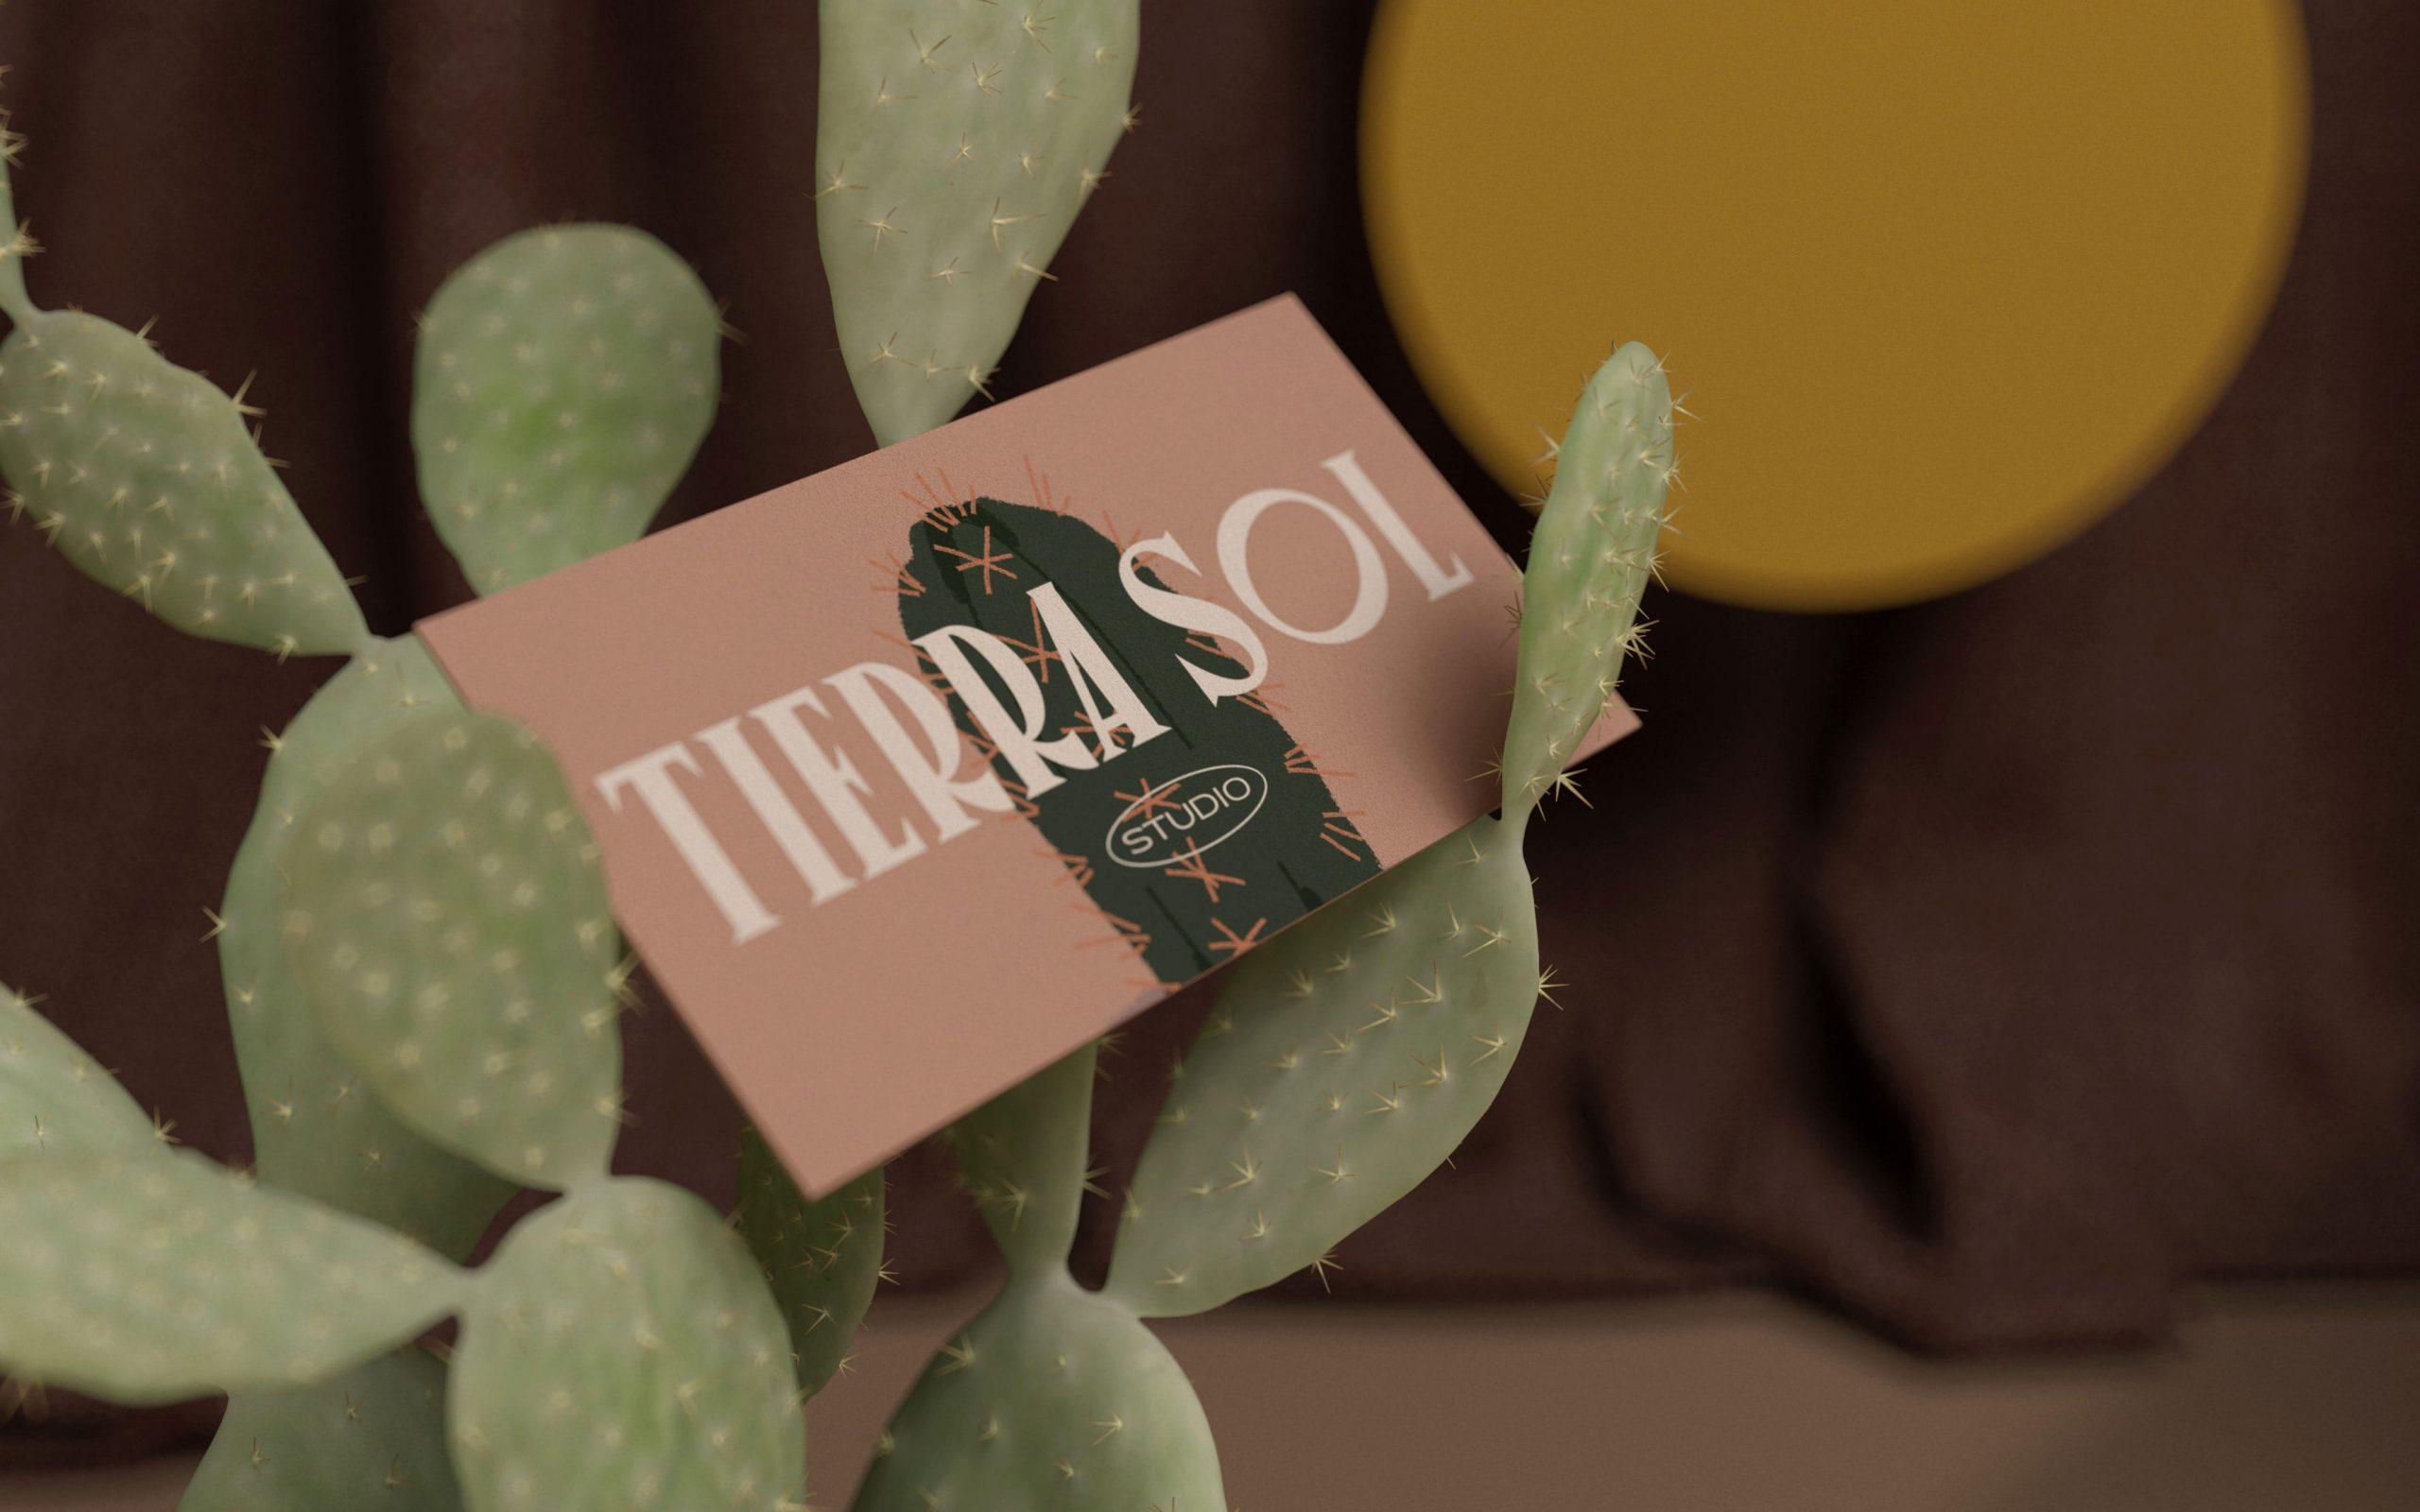 Tierra-Sol-04